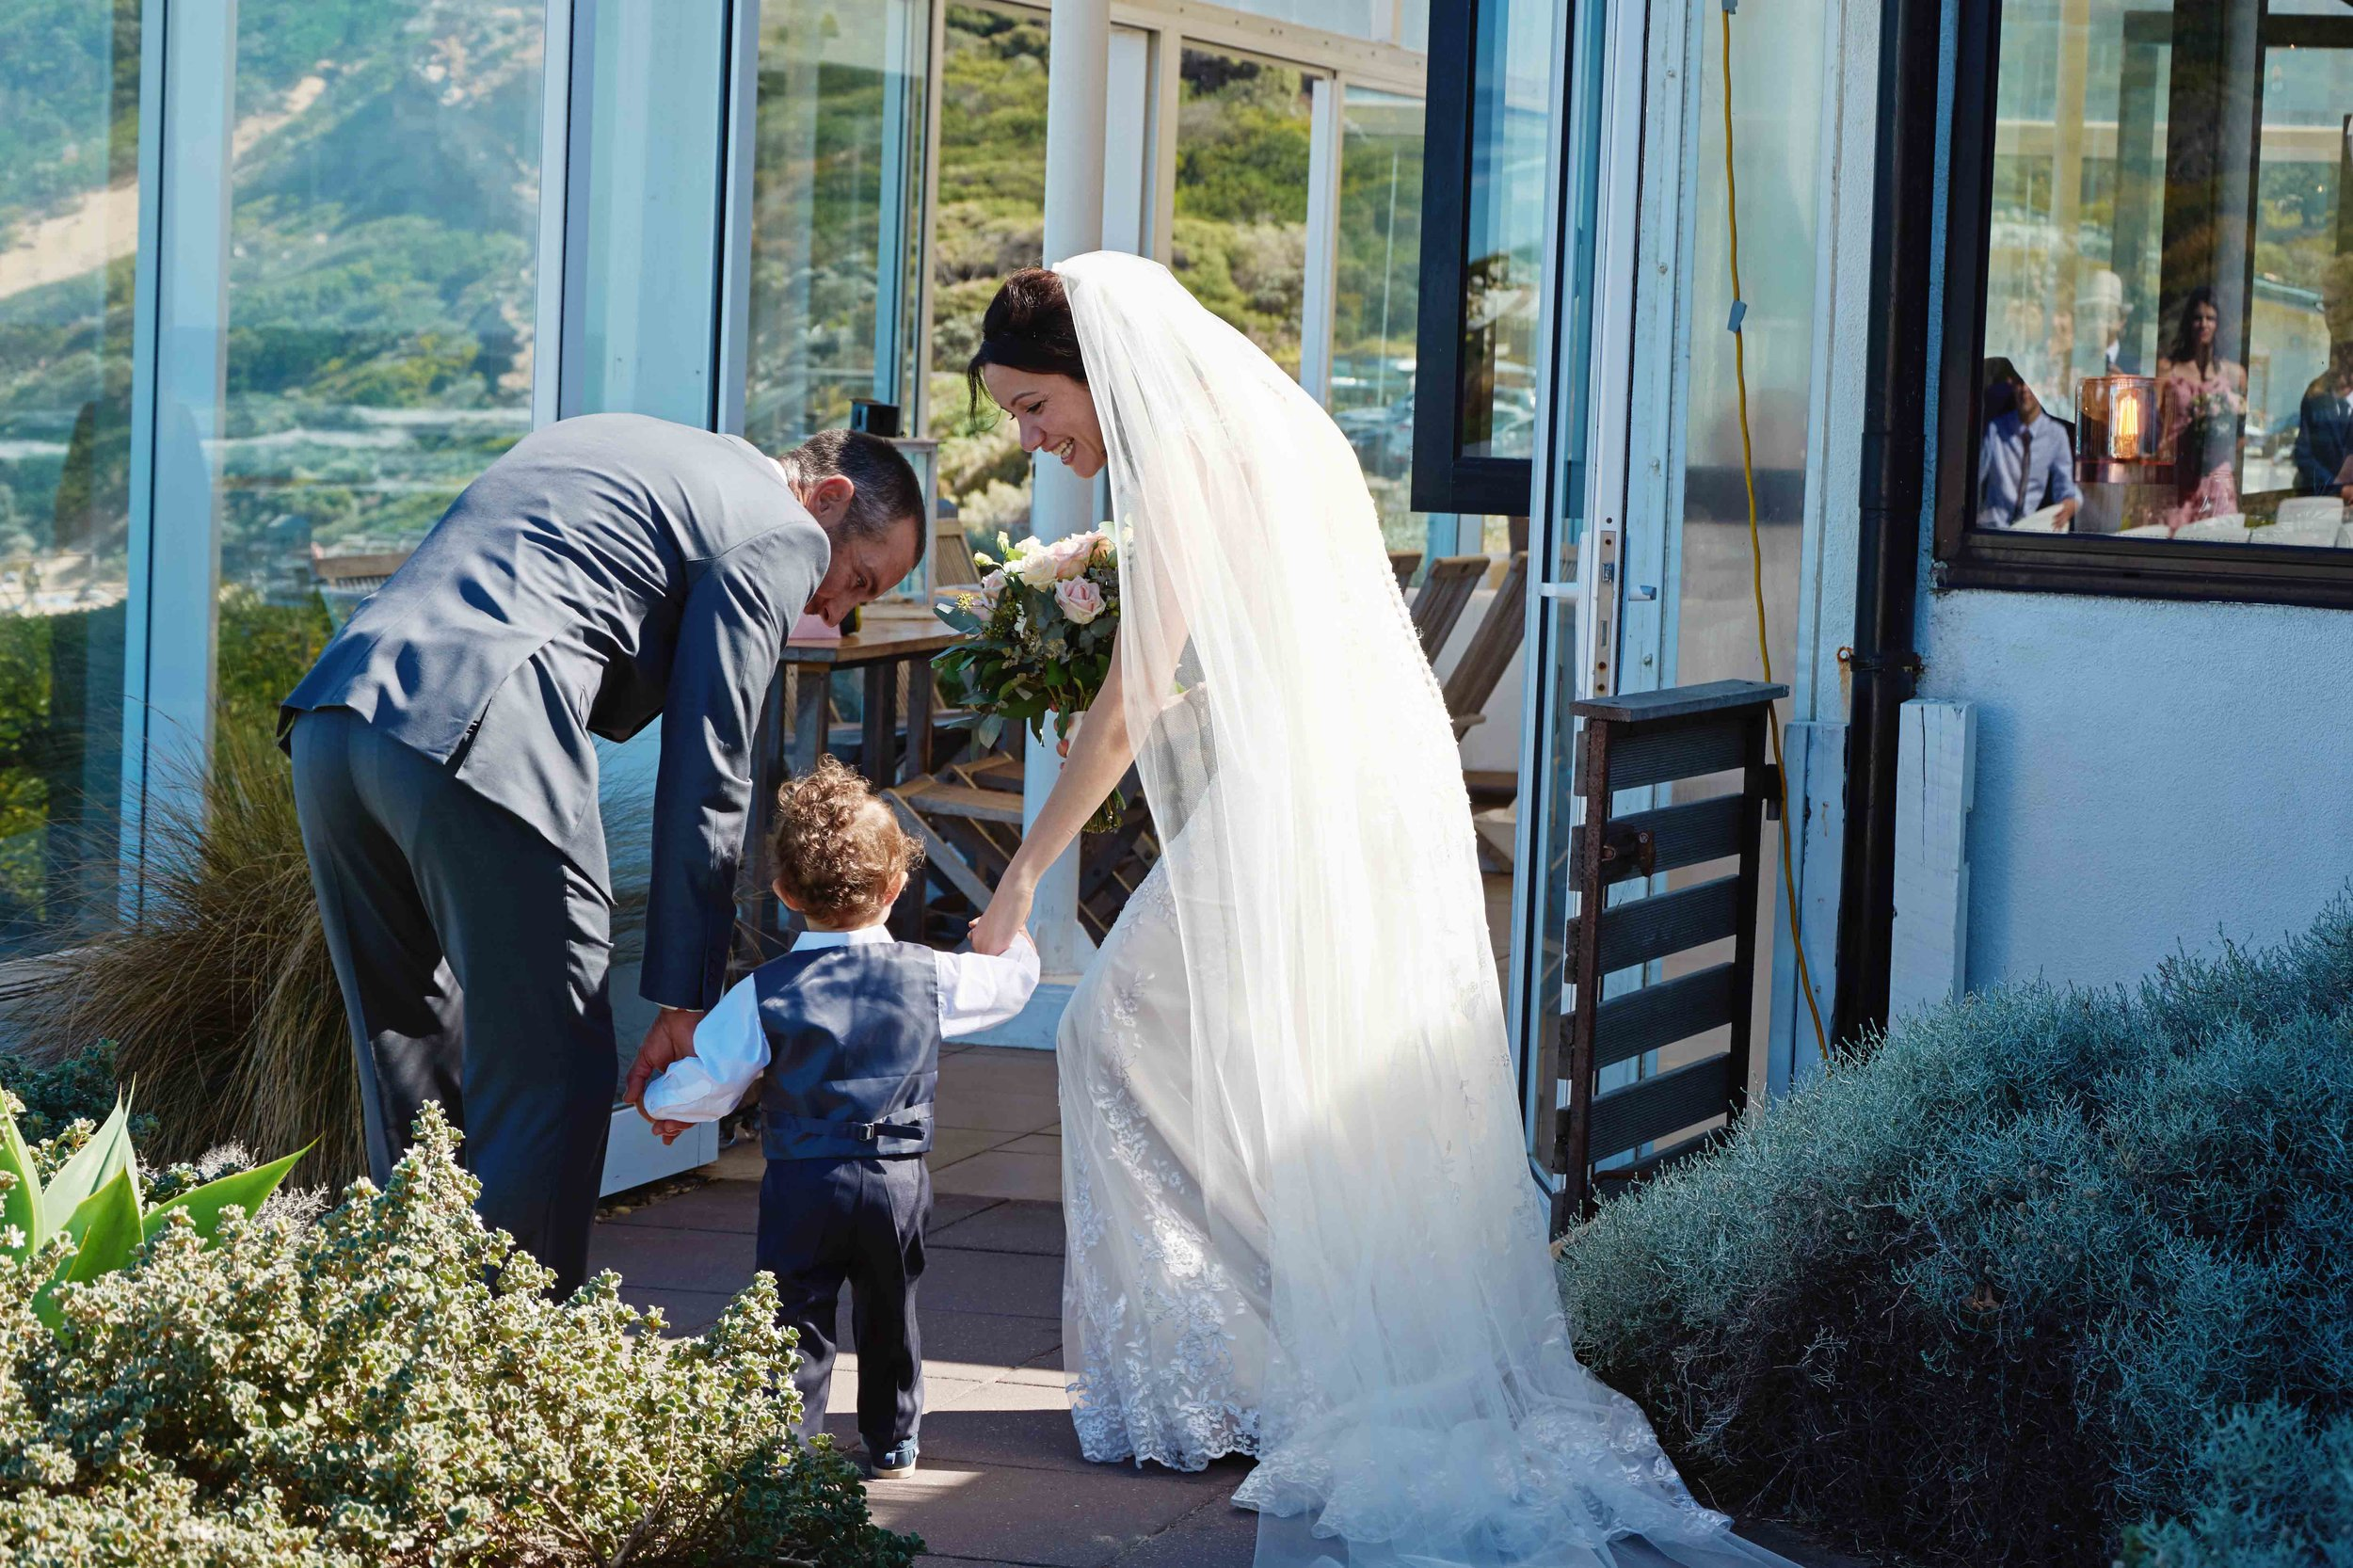 sorrento-wedding-photography-all-smiles-marissa-jade-photography-60.jpg